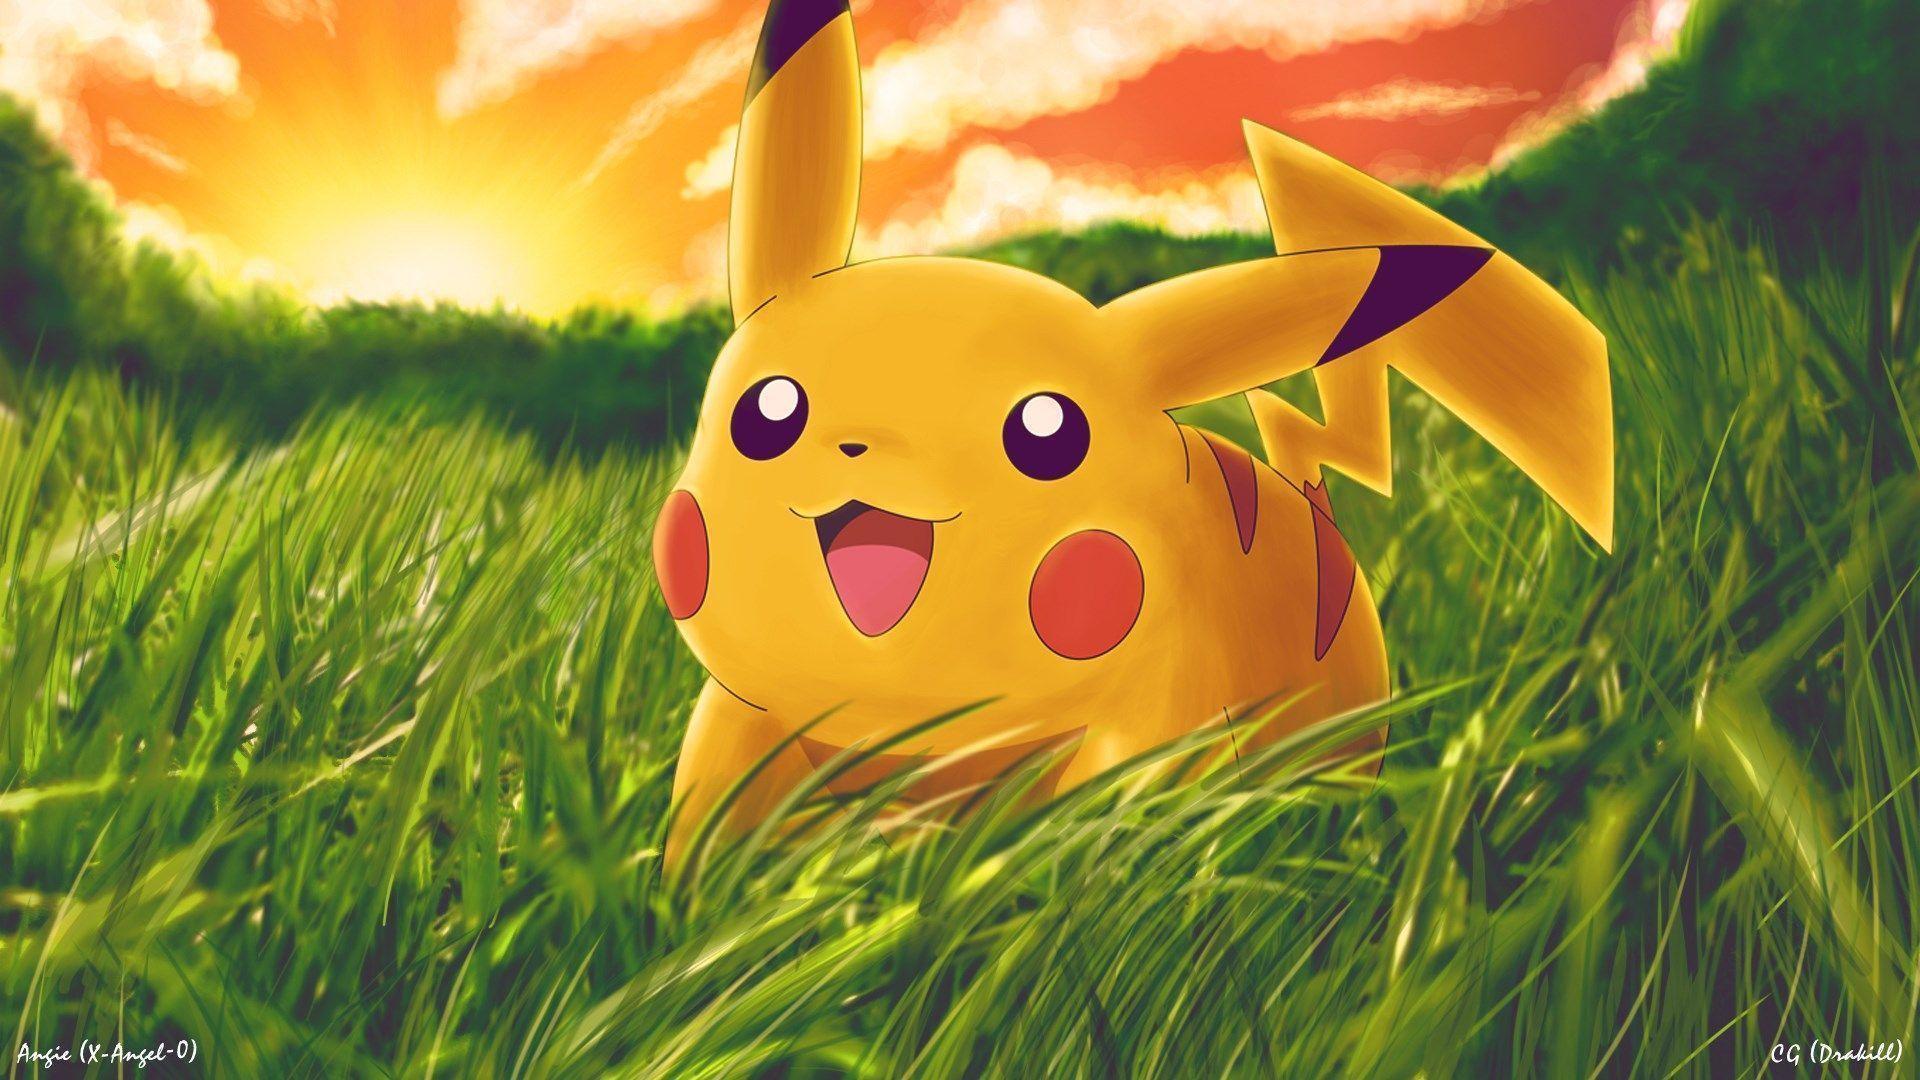 Pikachu Pokemon Cartoon Picture - Cartoon HD Wallpapers